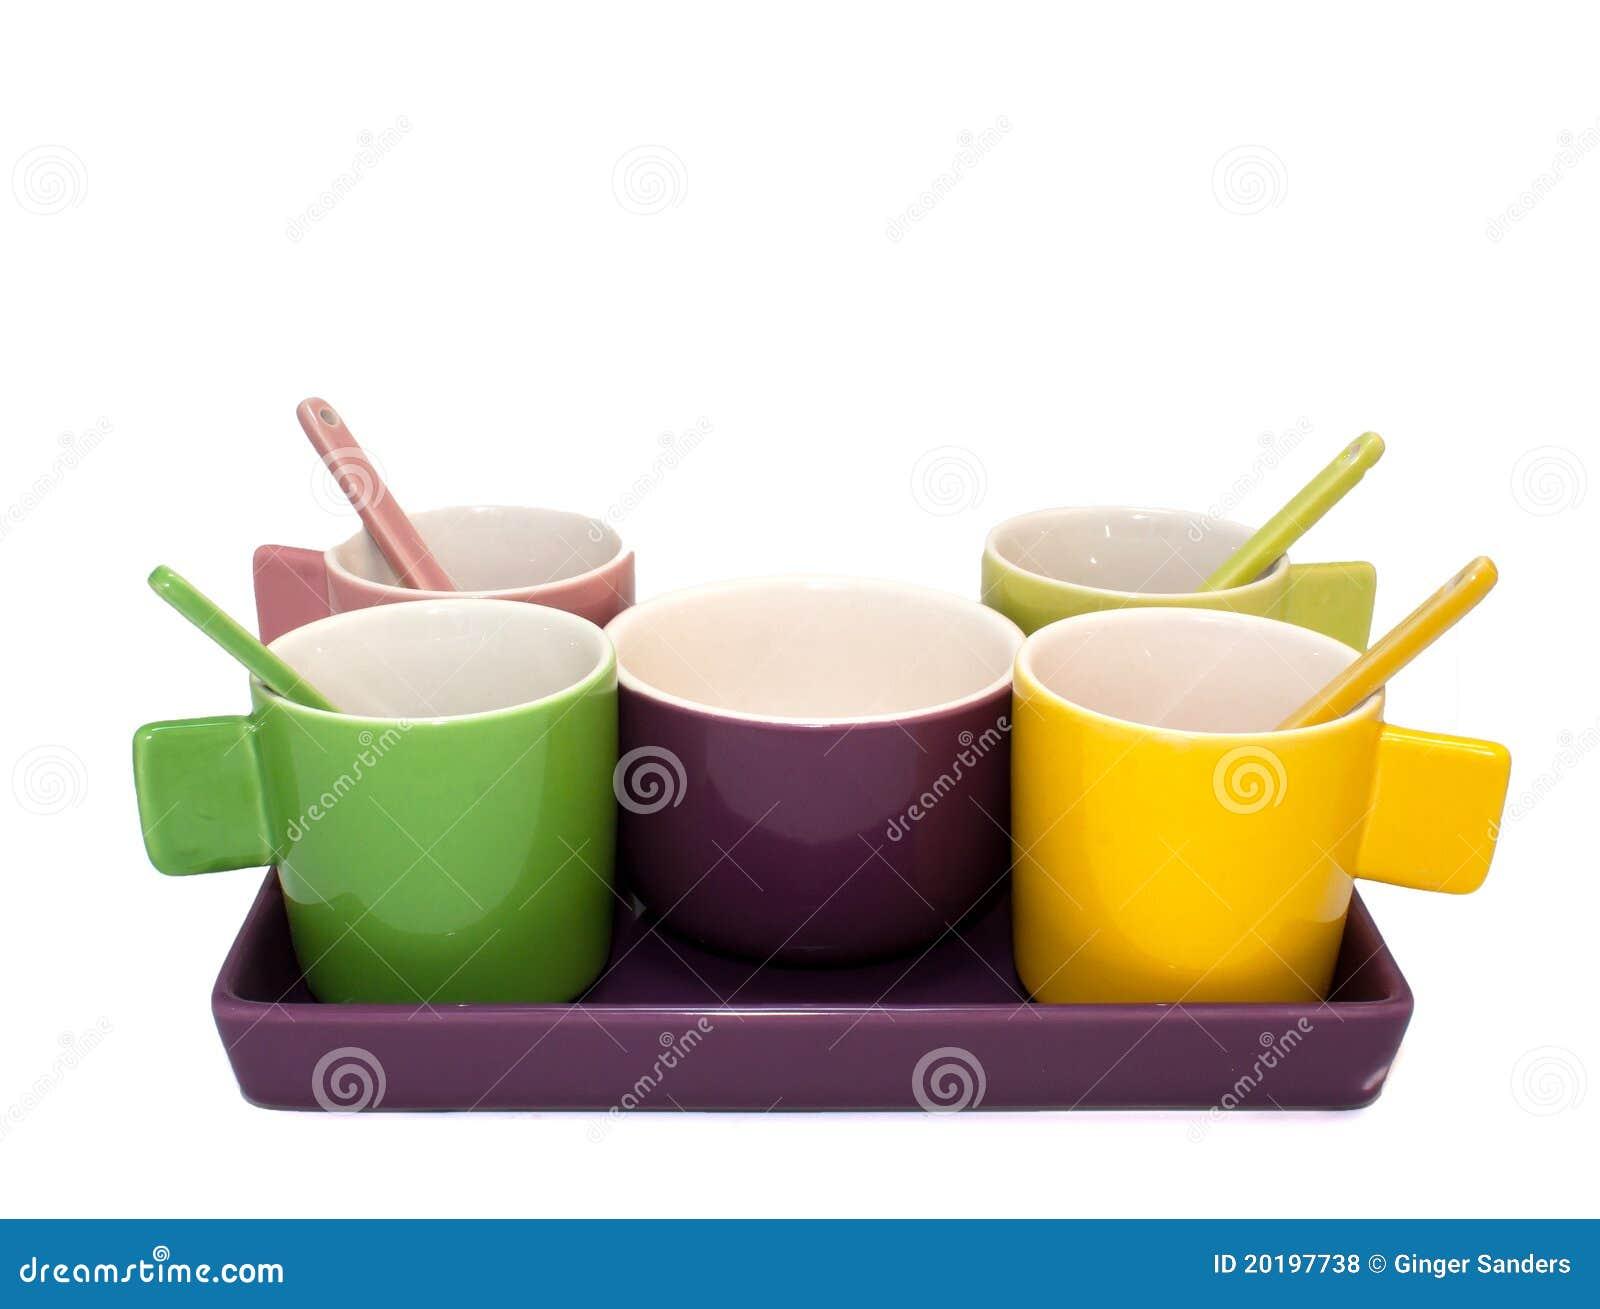 Colored Espresso Coffee Cup Set on White